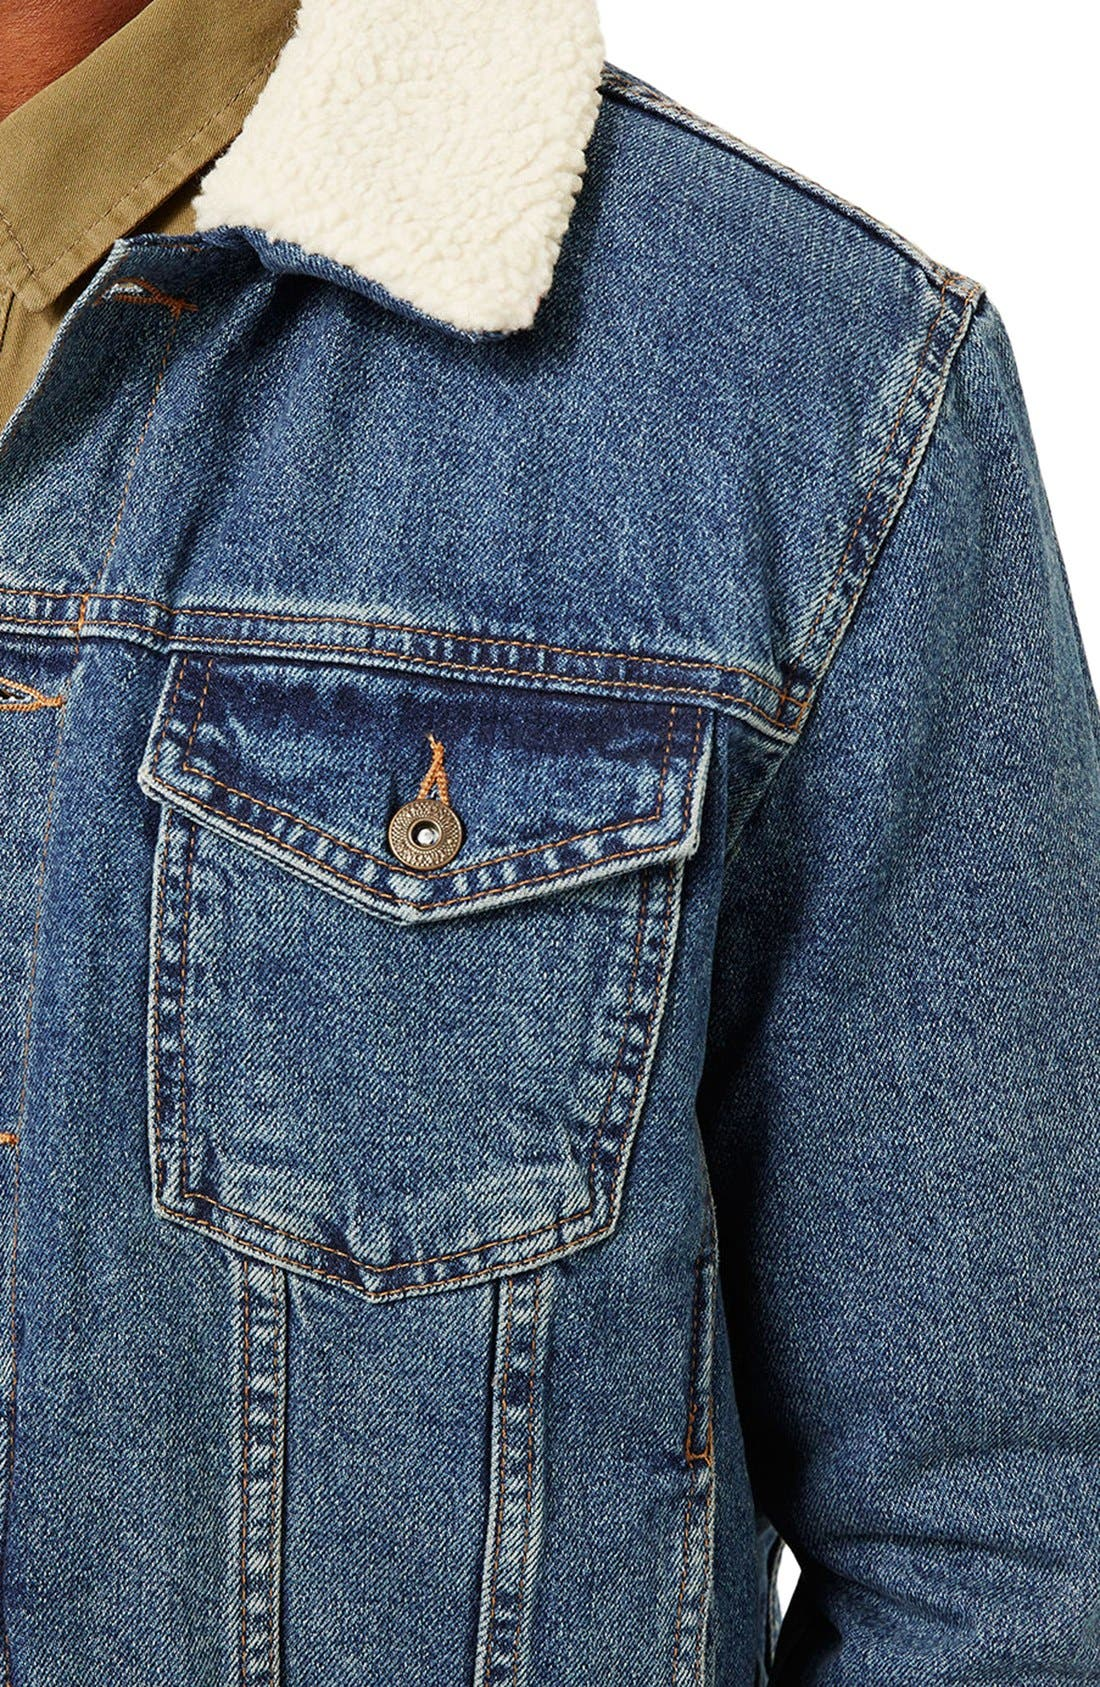 Borg Denim Jacket,                             Alternate thumbnail 4, color,                             Blue